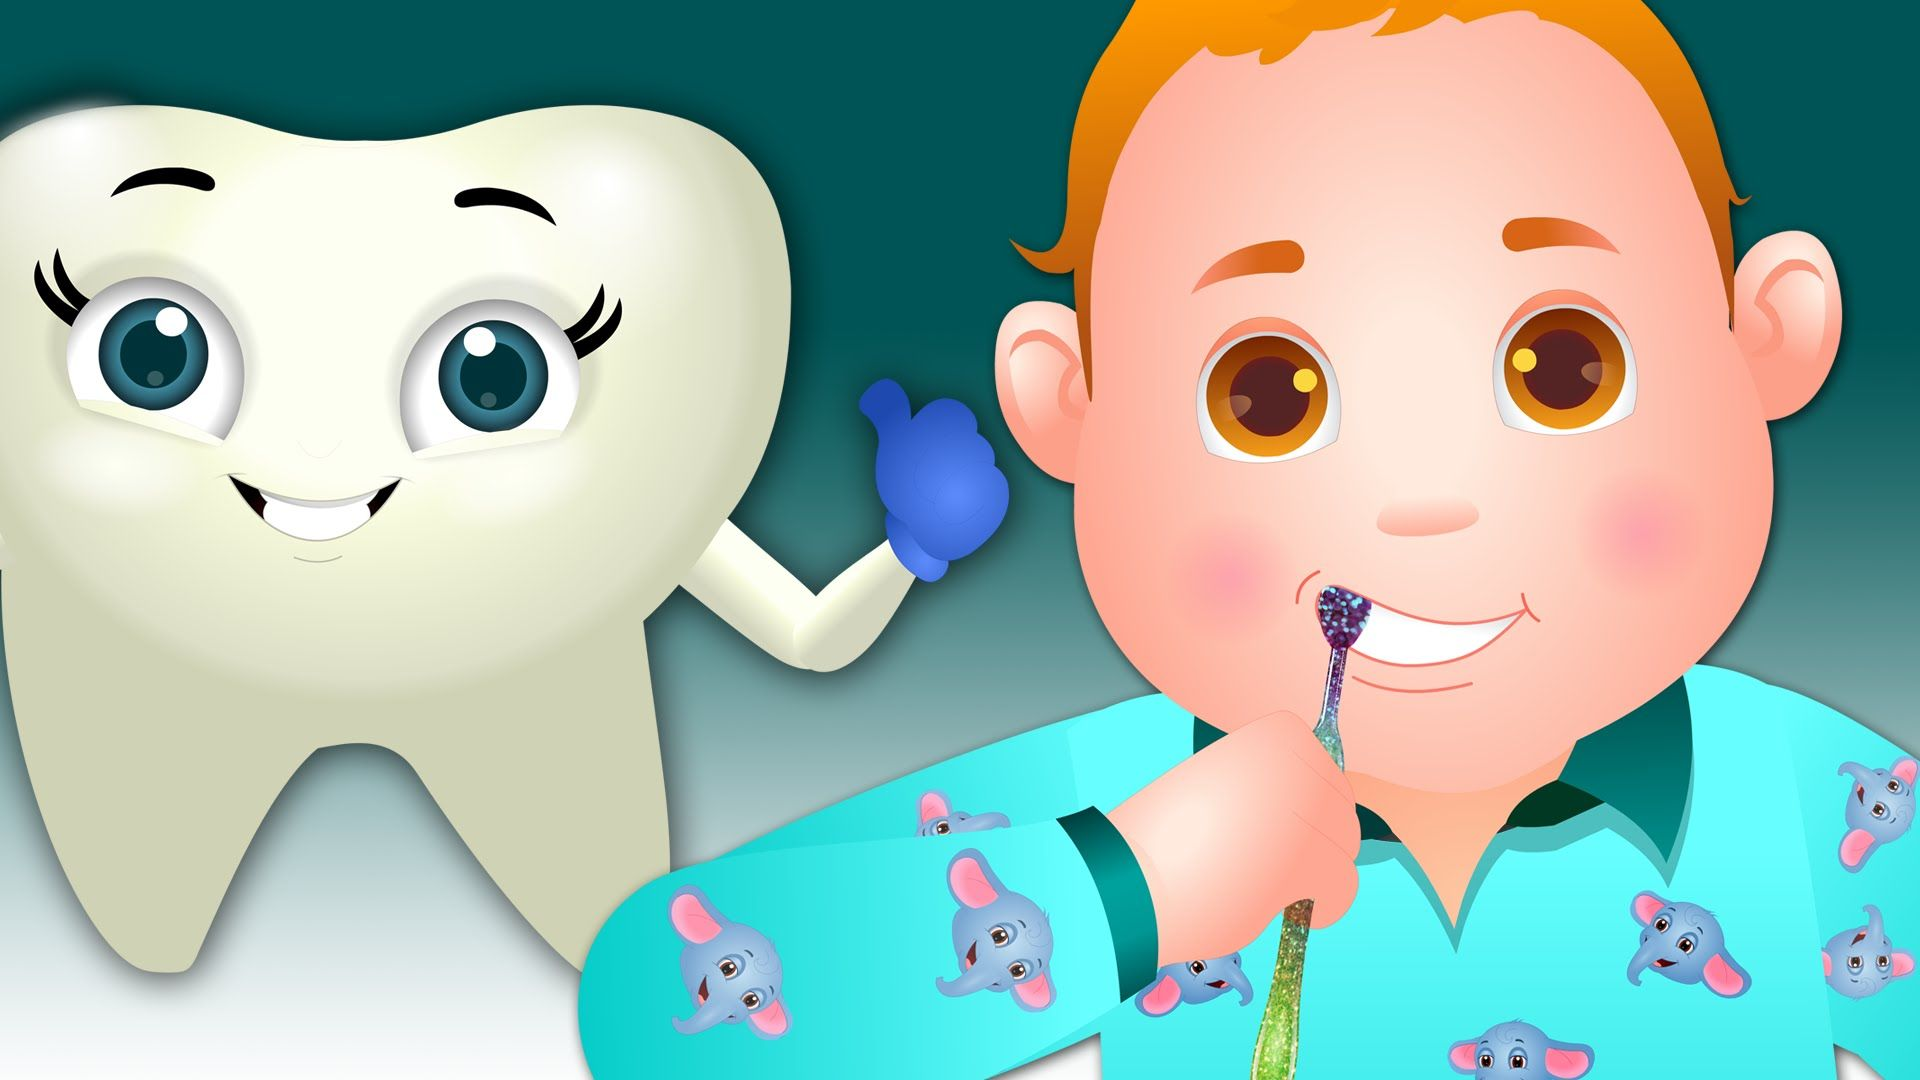 Brush Your Teeth Song Good Habits Nursery Rhymes For Children Chuchu Tv Kids Nursery Rhymes Rhymes For Kids Good Habits For Kids